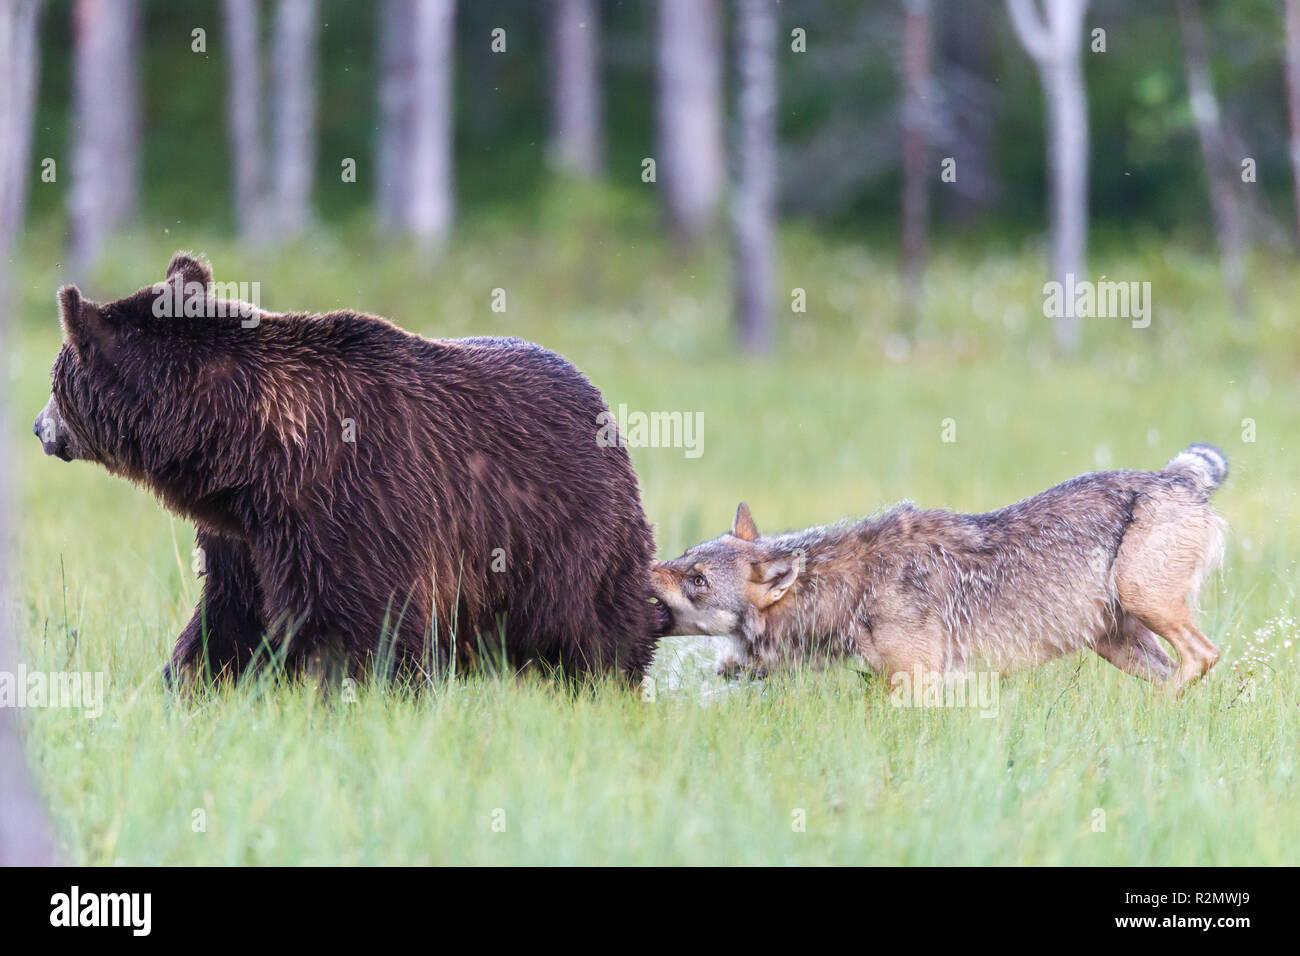 Wolf Angriffe Braunbär Stockfoto